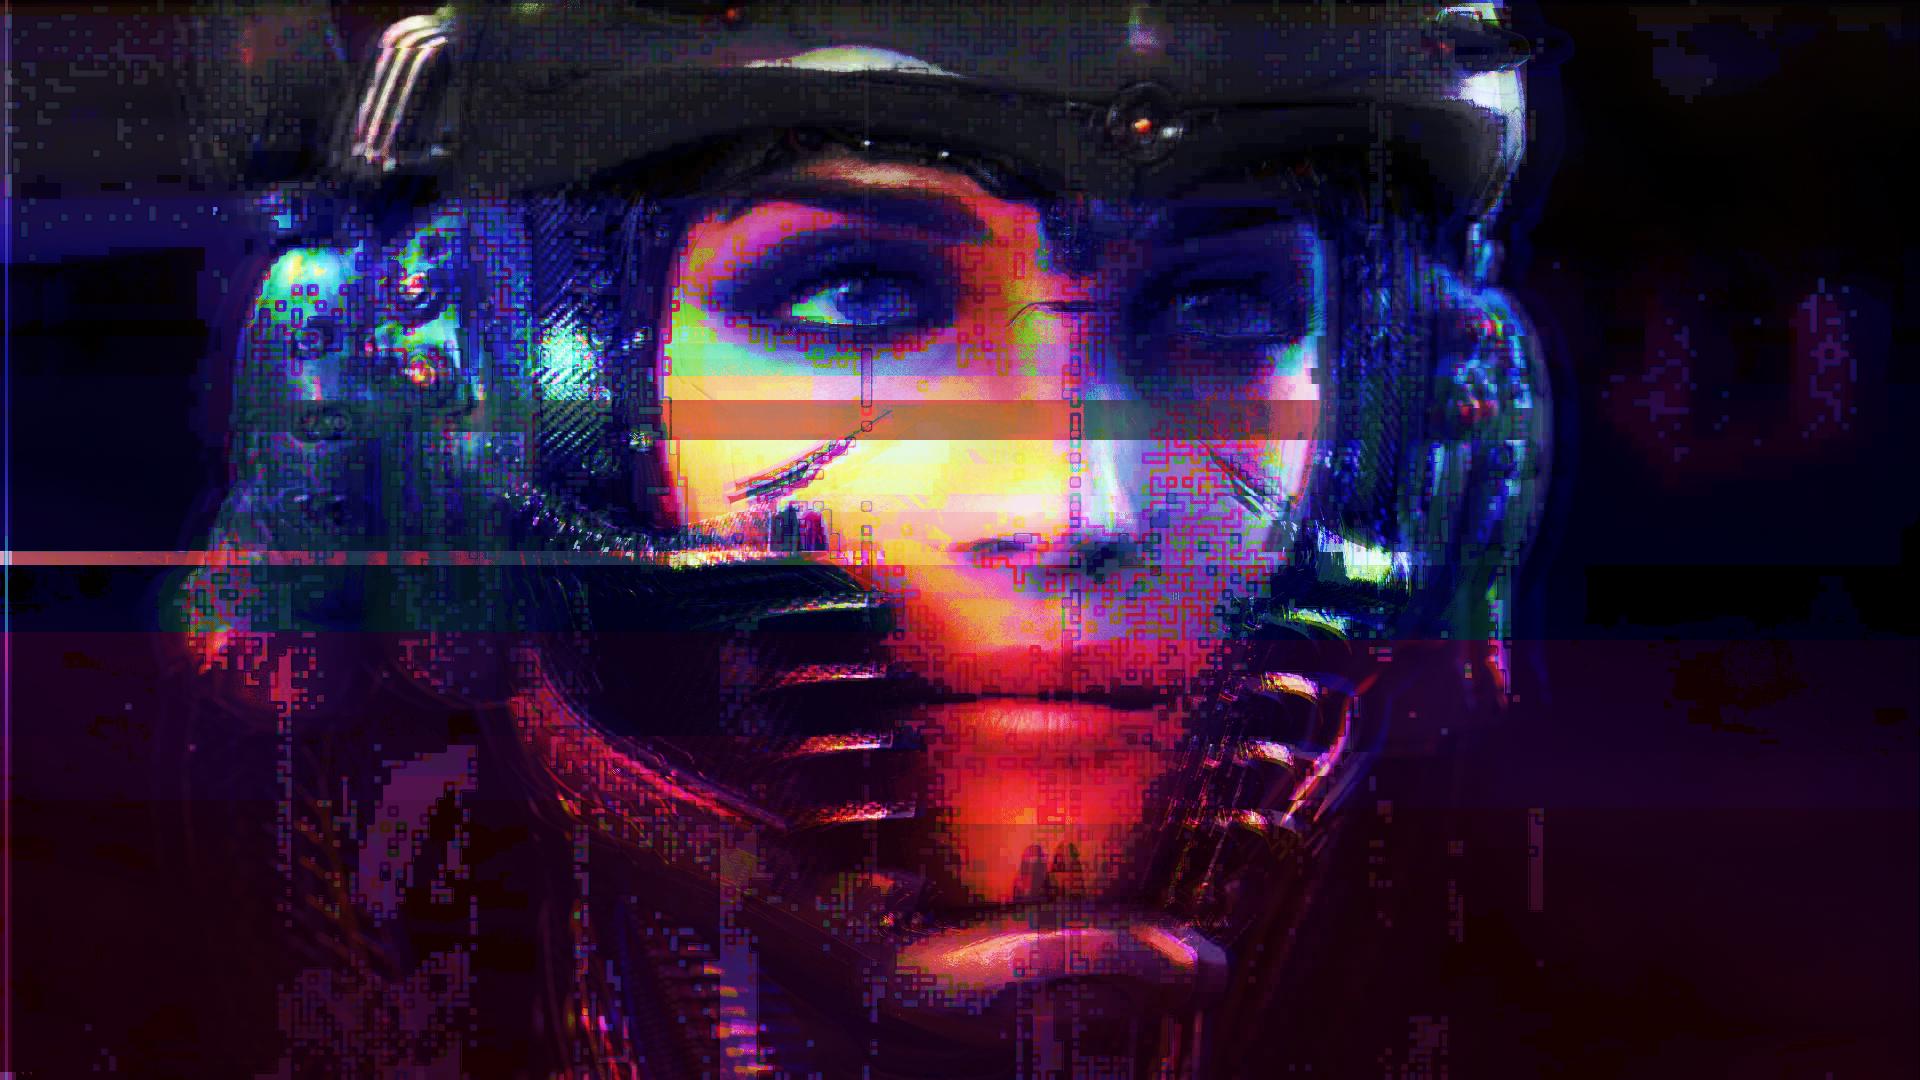 General 1920x1080 cyberpunk glitch art digital art women